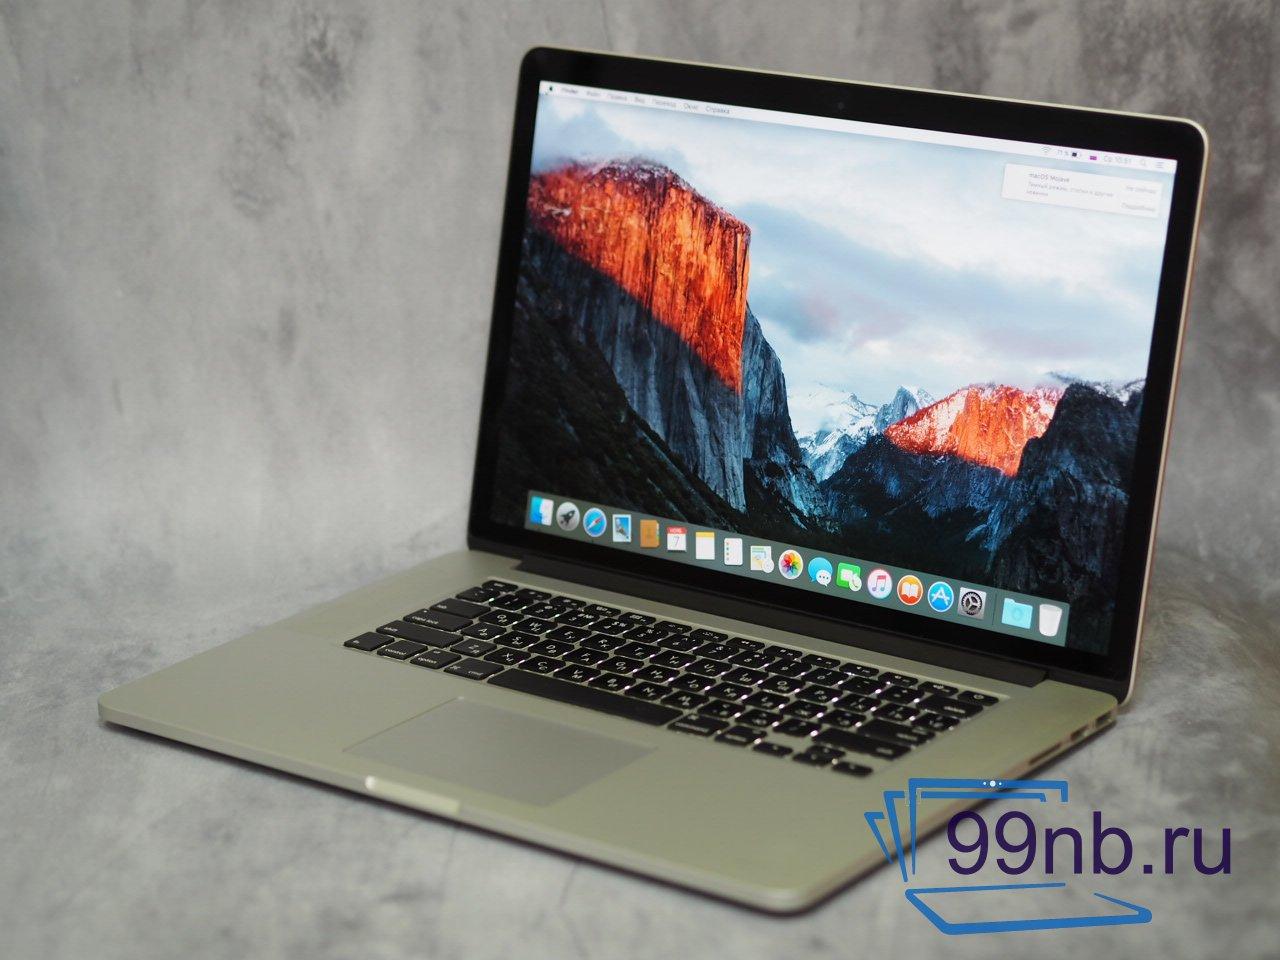 Macbook - классика легендарного бренда